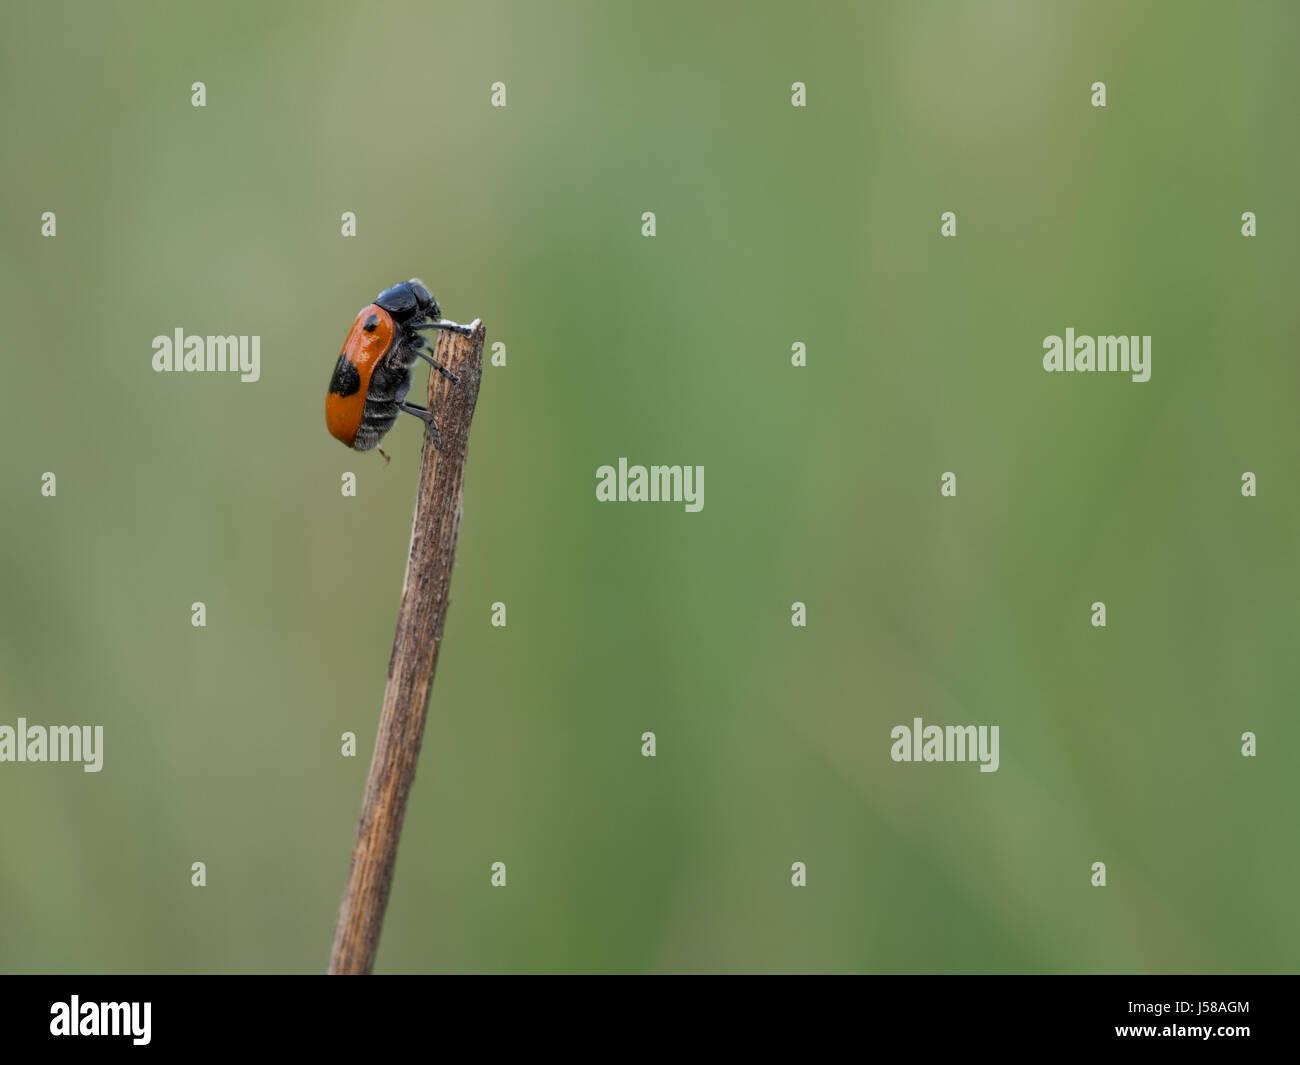 Short-horned leaf beetle - Clytra laeviuscula - Stock Image